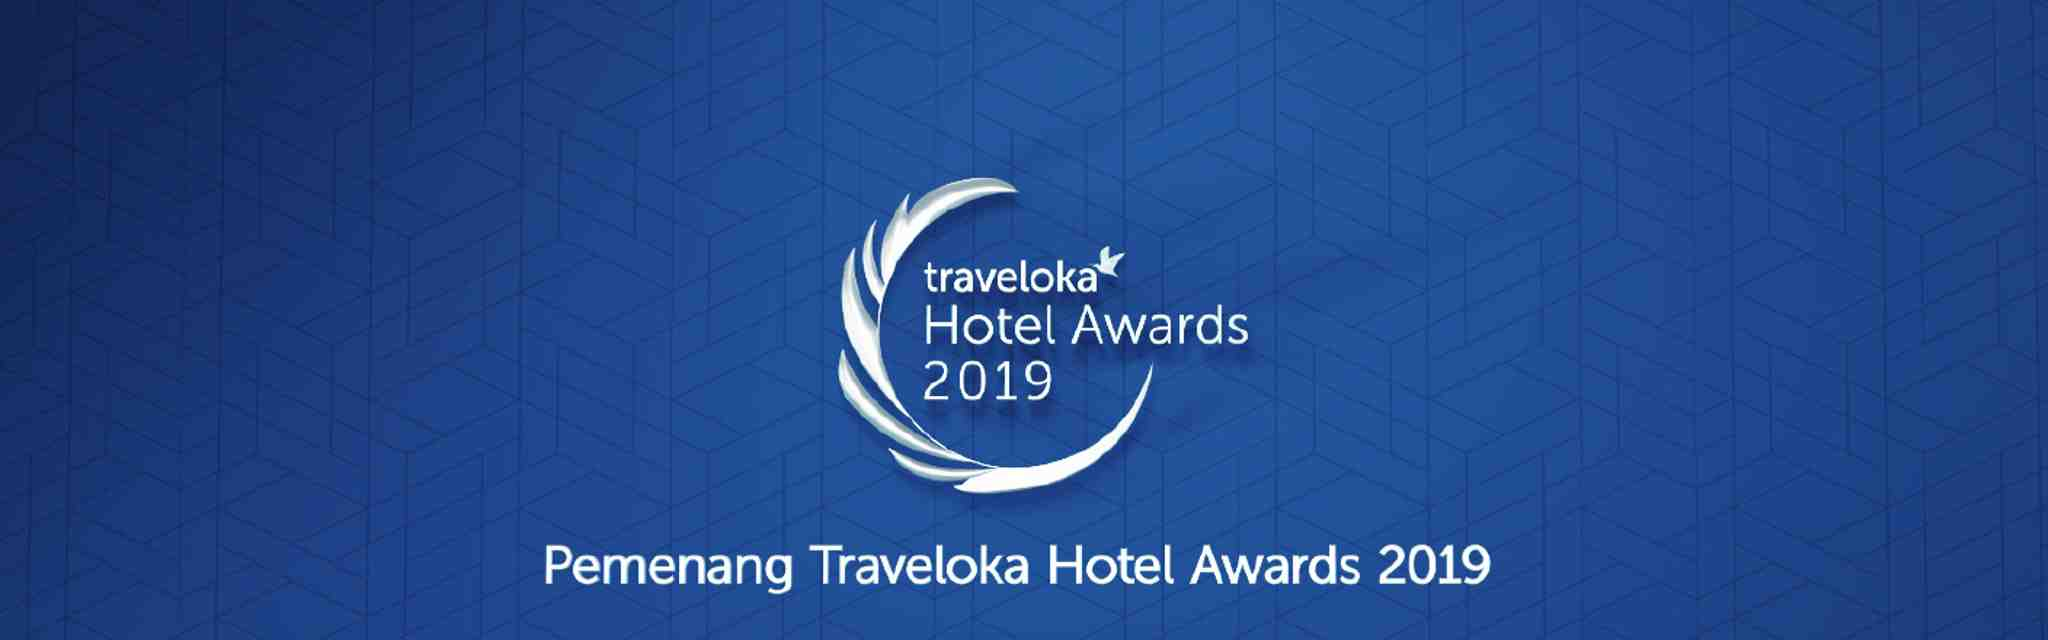 Traveloka Hotel Awards 2019 Daftar Hotel Pemenang Di Jawa Tengah